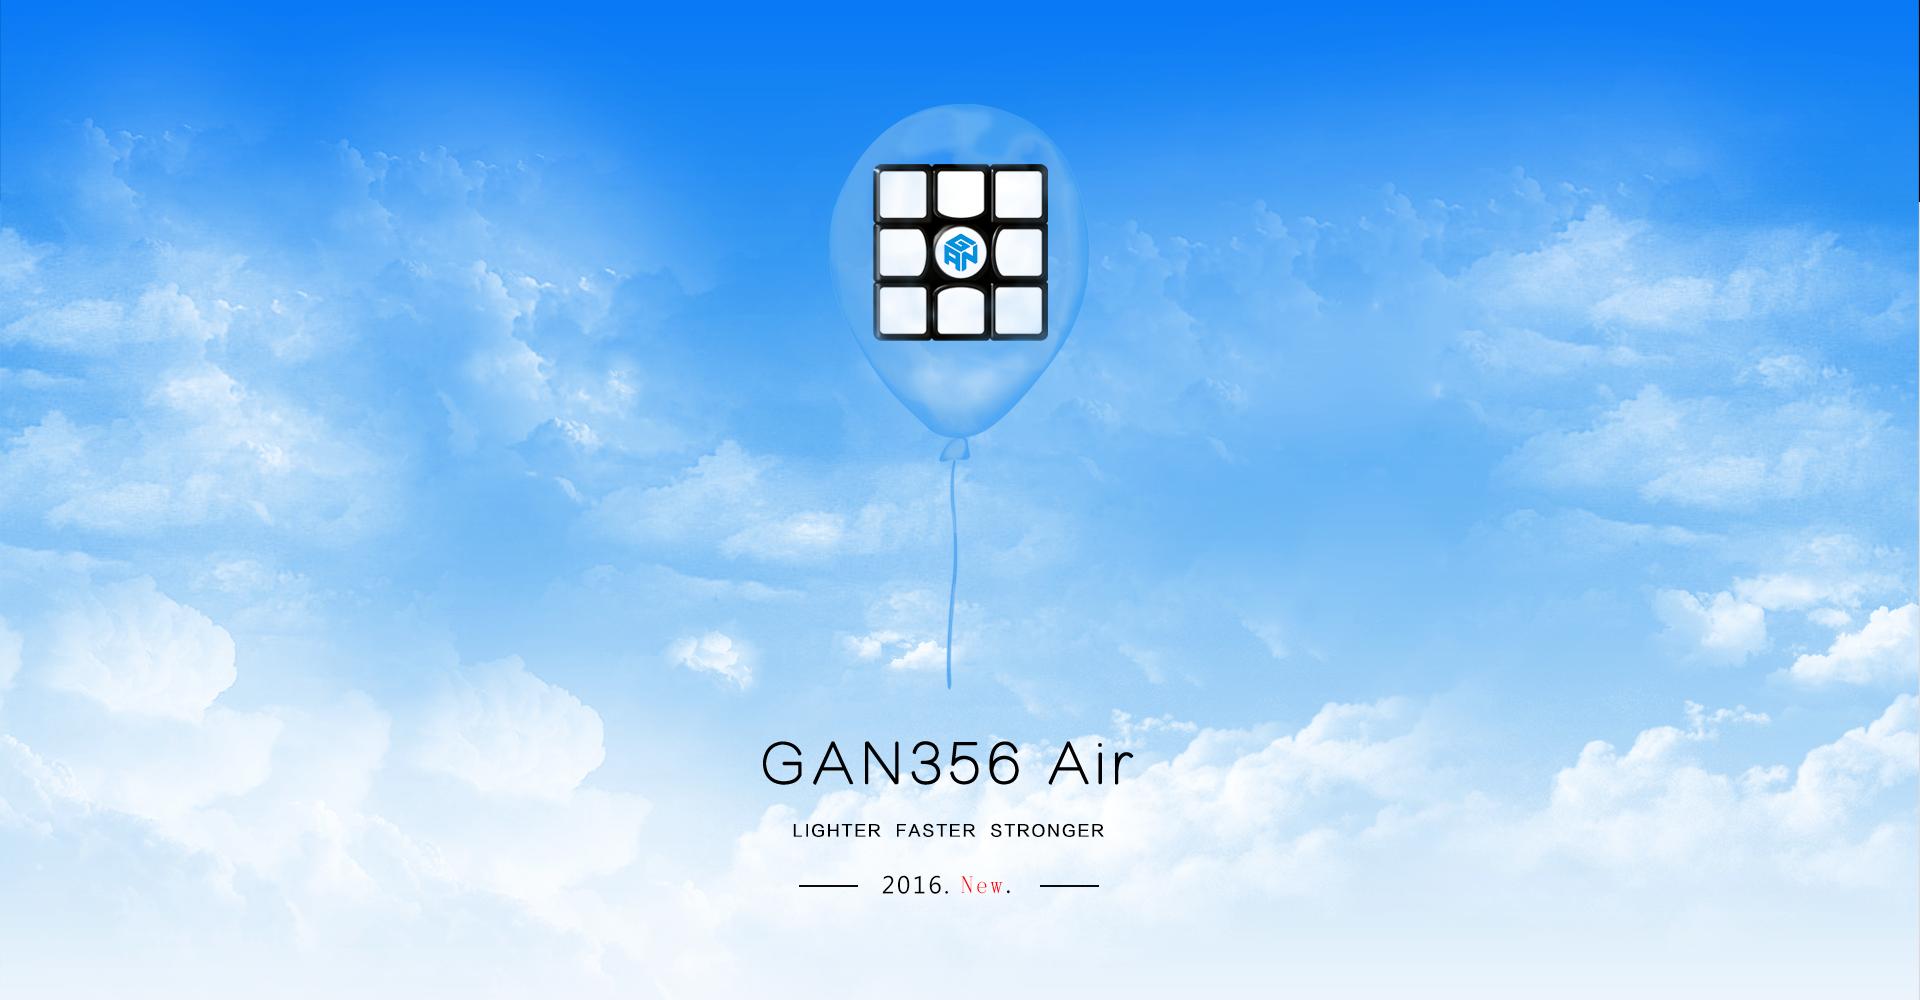 GAN356-Air-图文详情_01